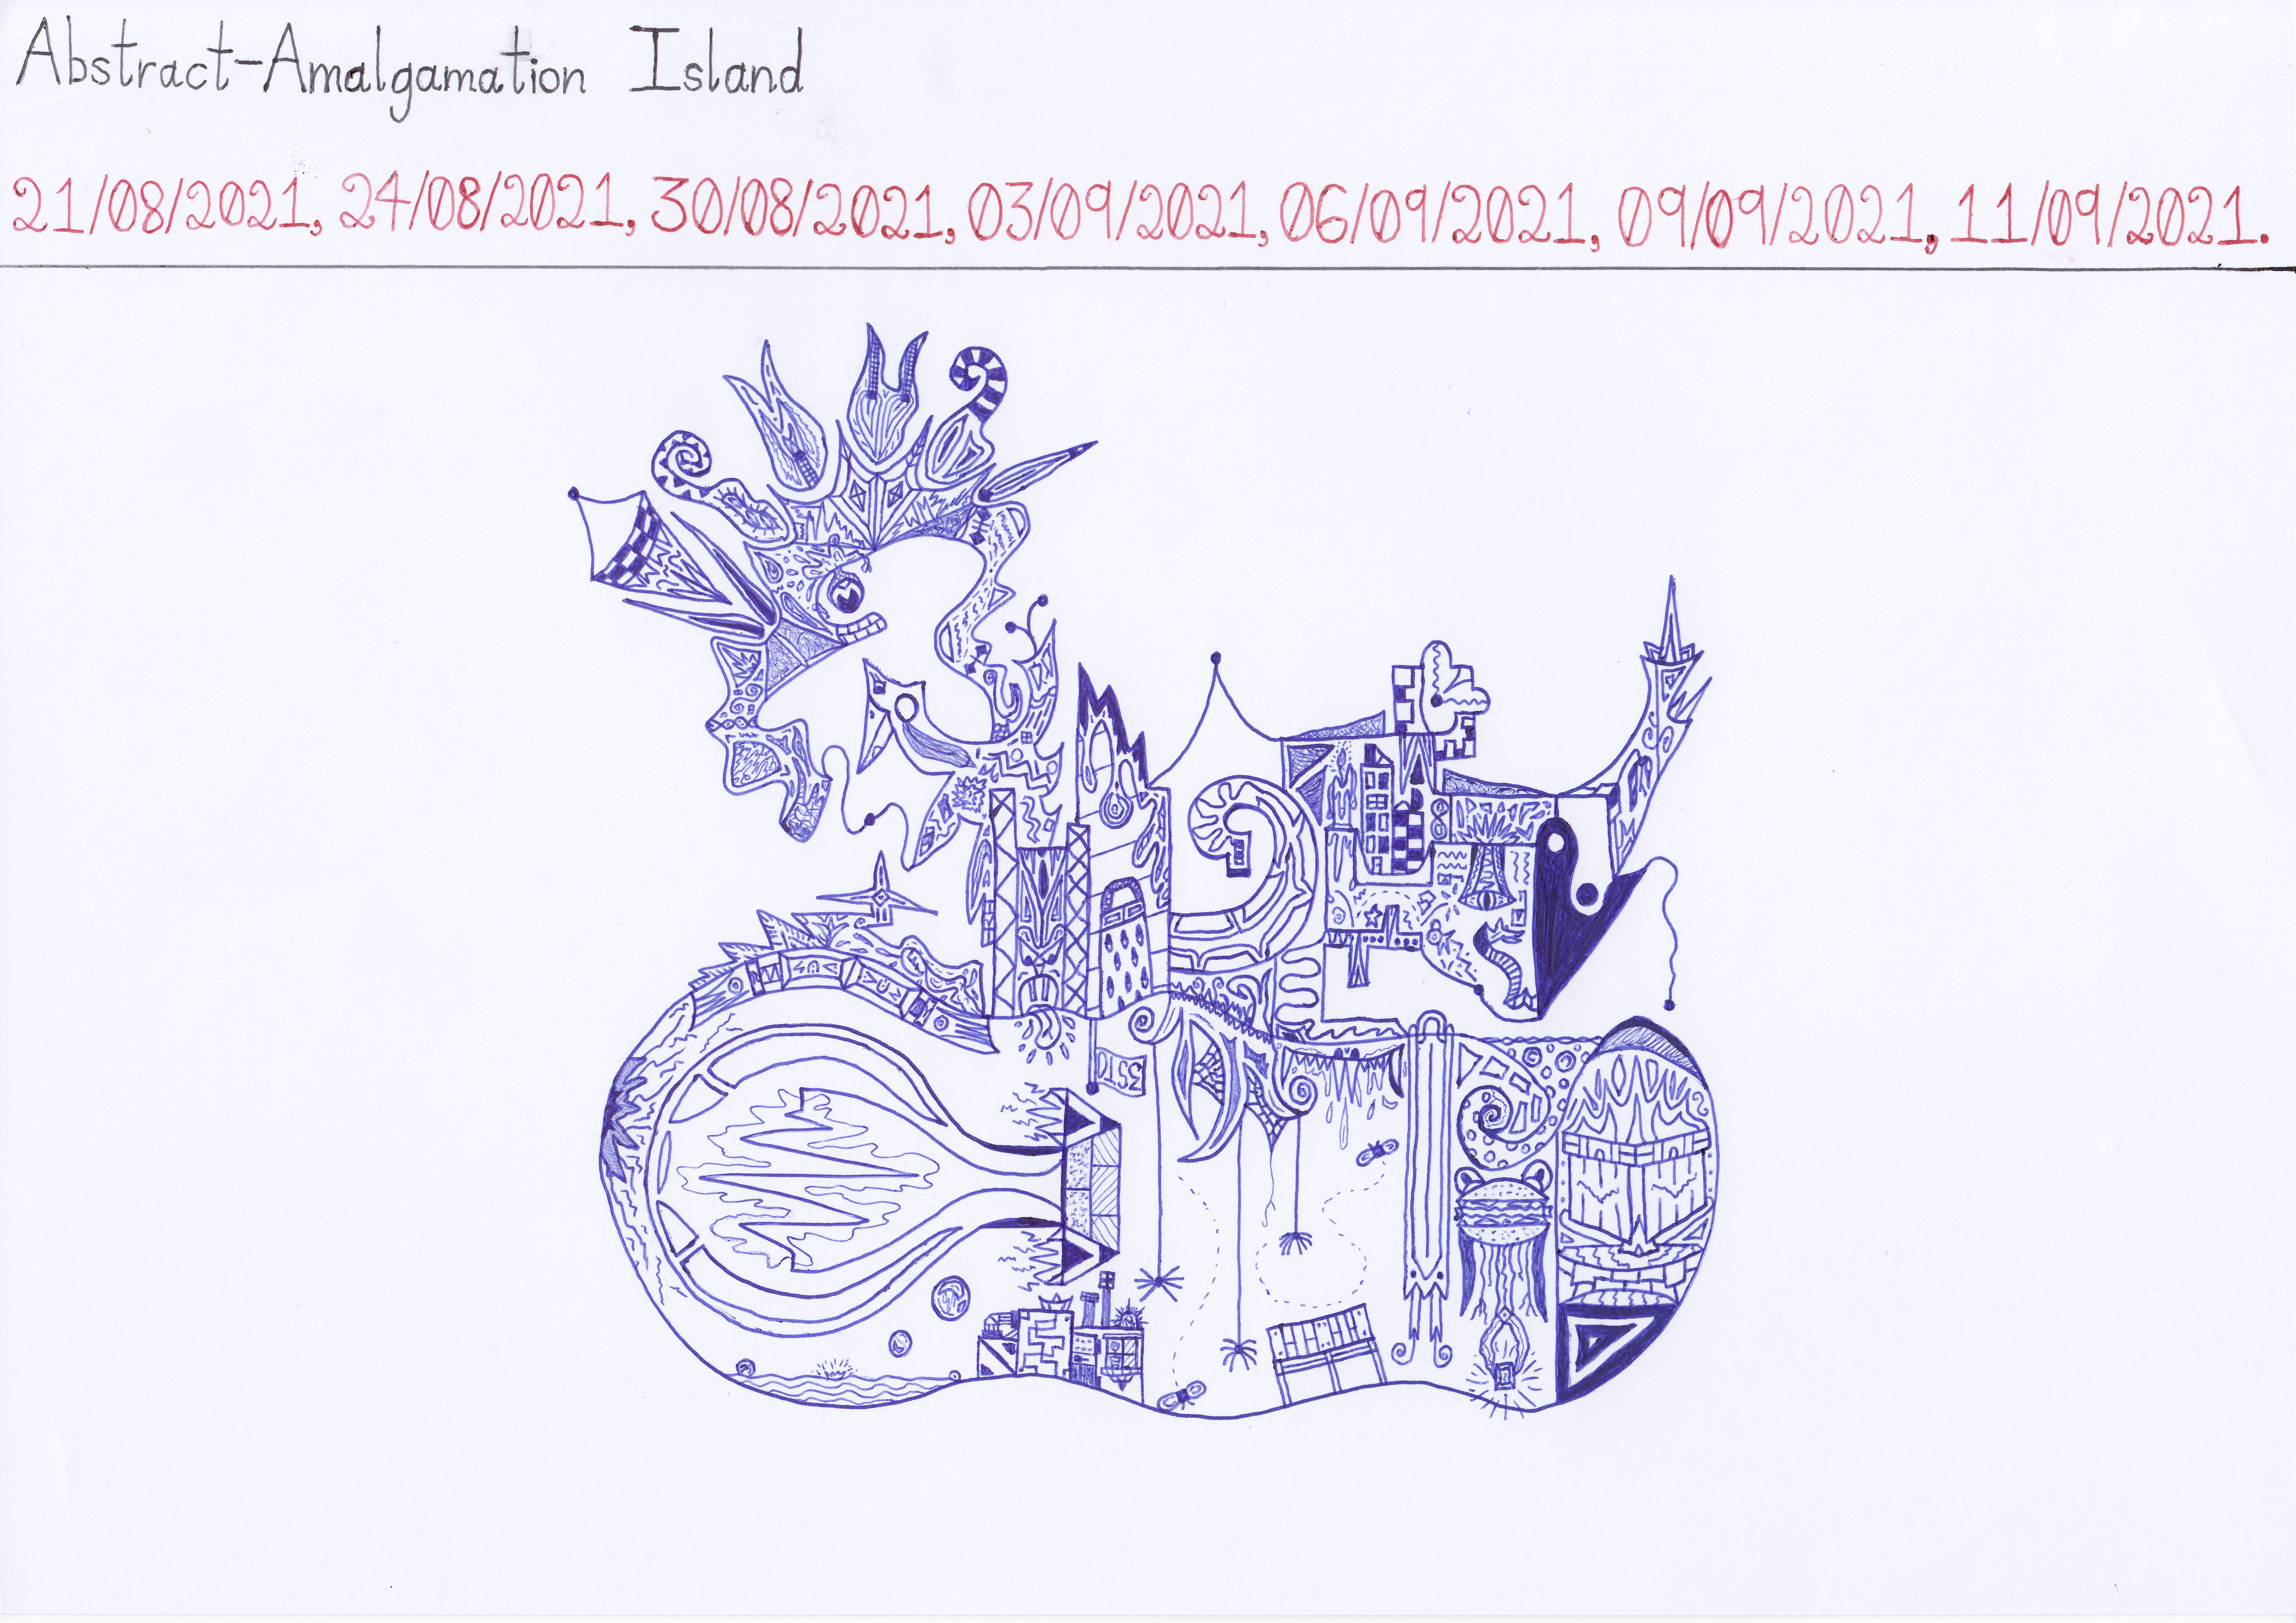 Art #107 — Abstract-Amalgamation Island